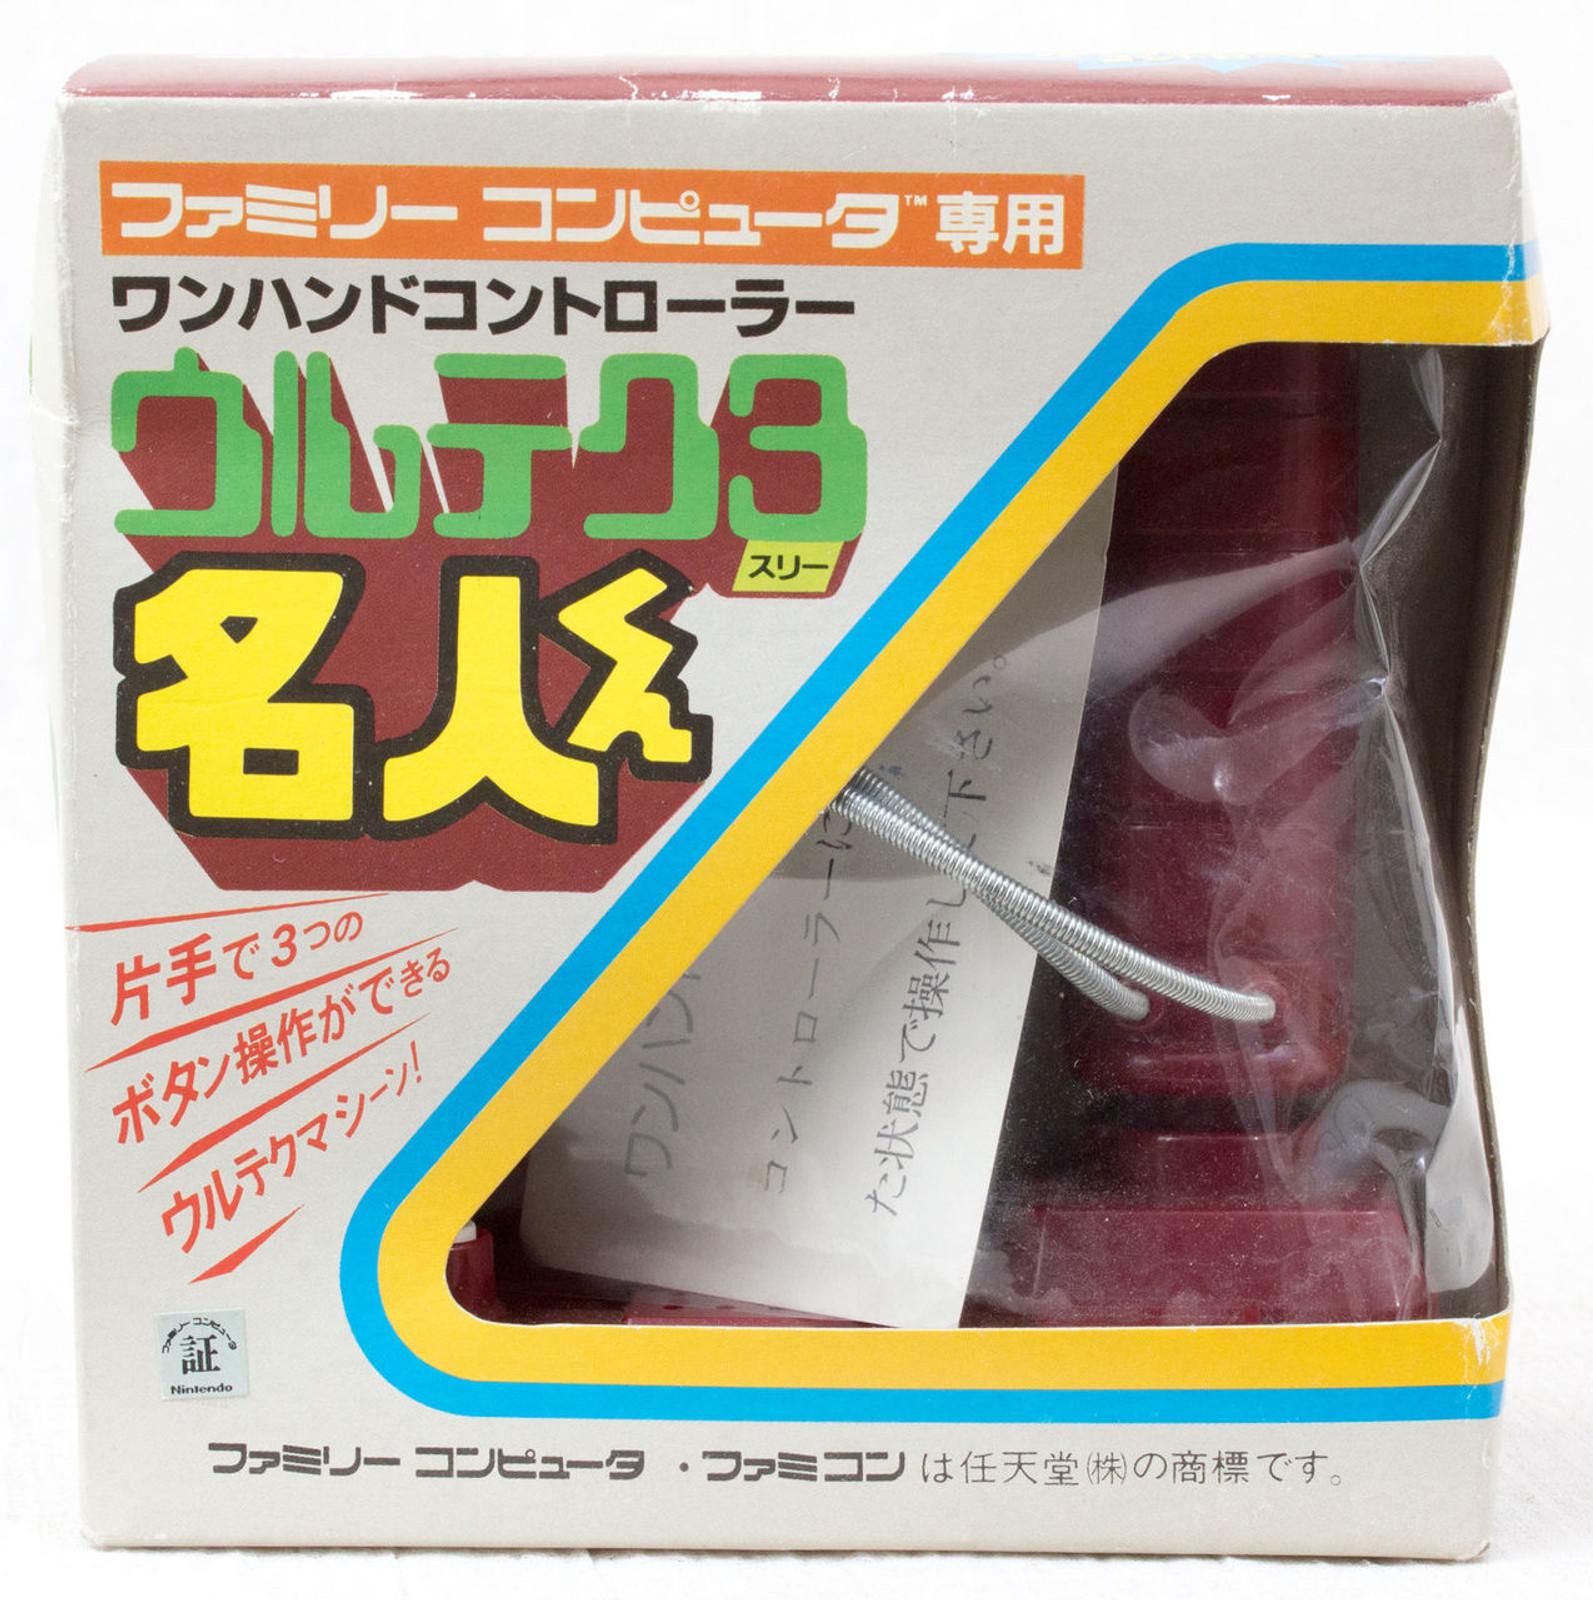 Uruteku 3 Meijin Kun One Hand Controller for Nintendo Family Computer Famicom